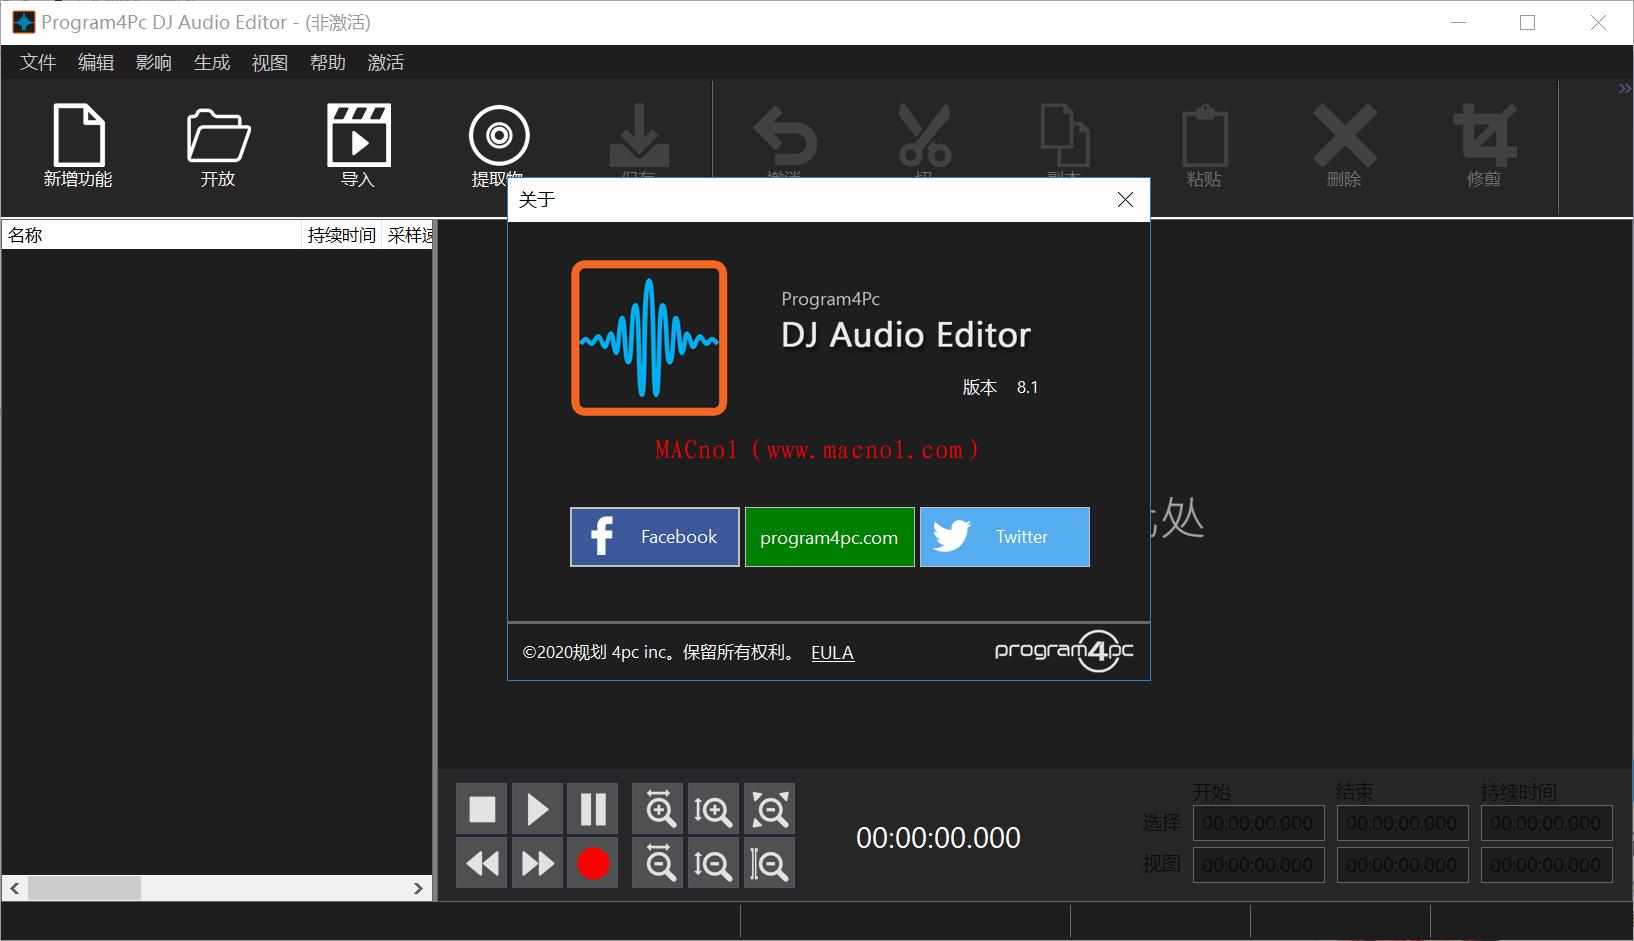 Program4Pc DJ Audio Editor 破解版.png